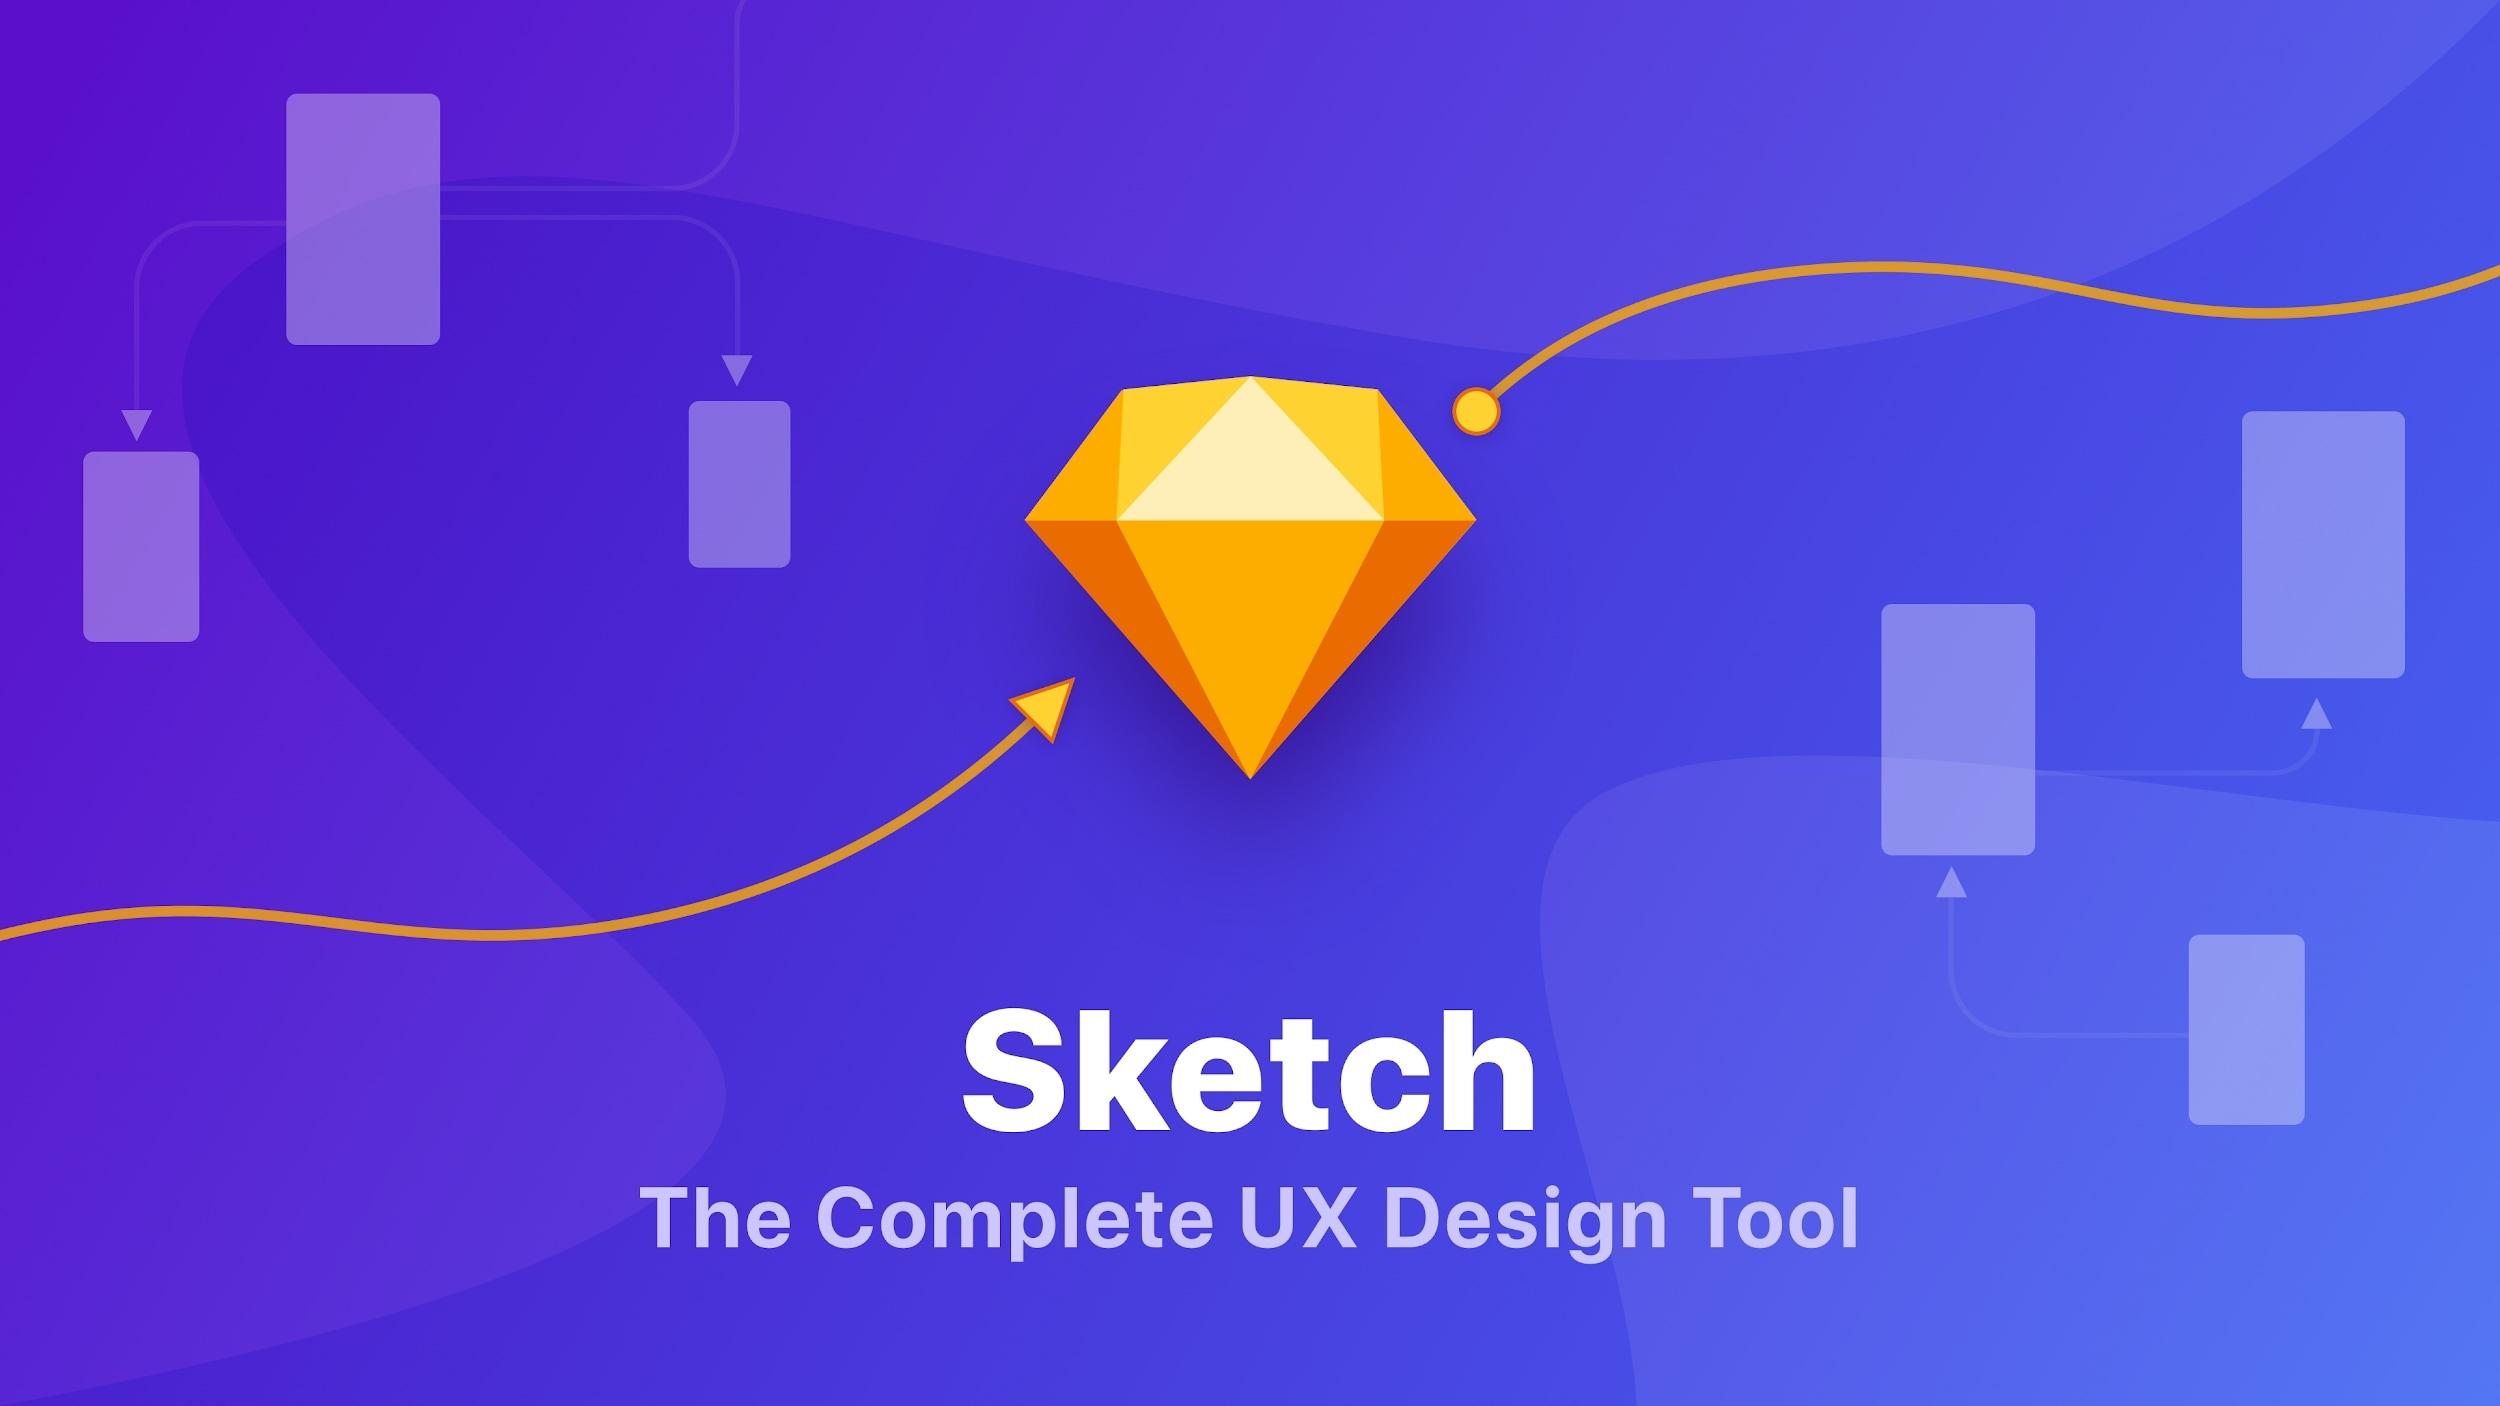 Job responsibilities of UX designer